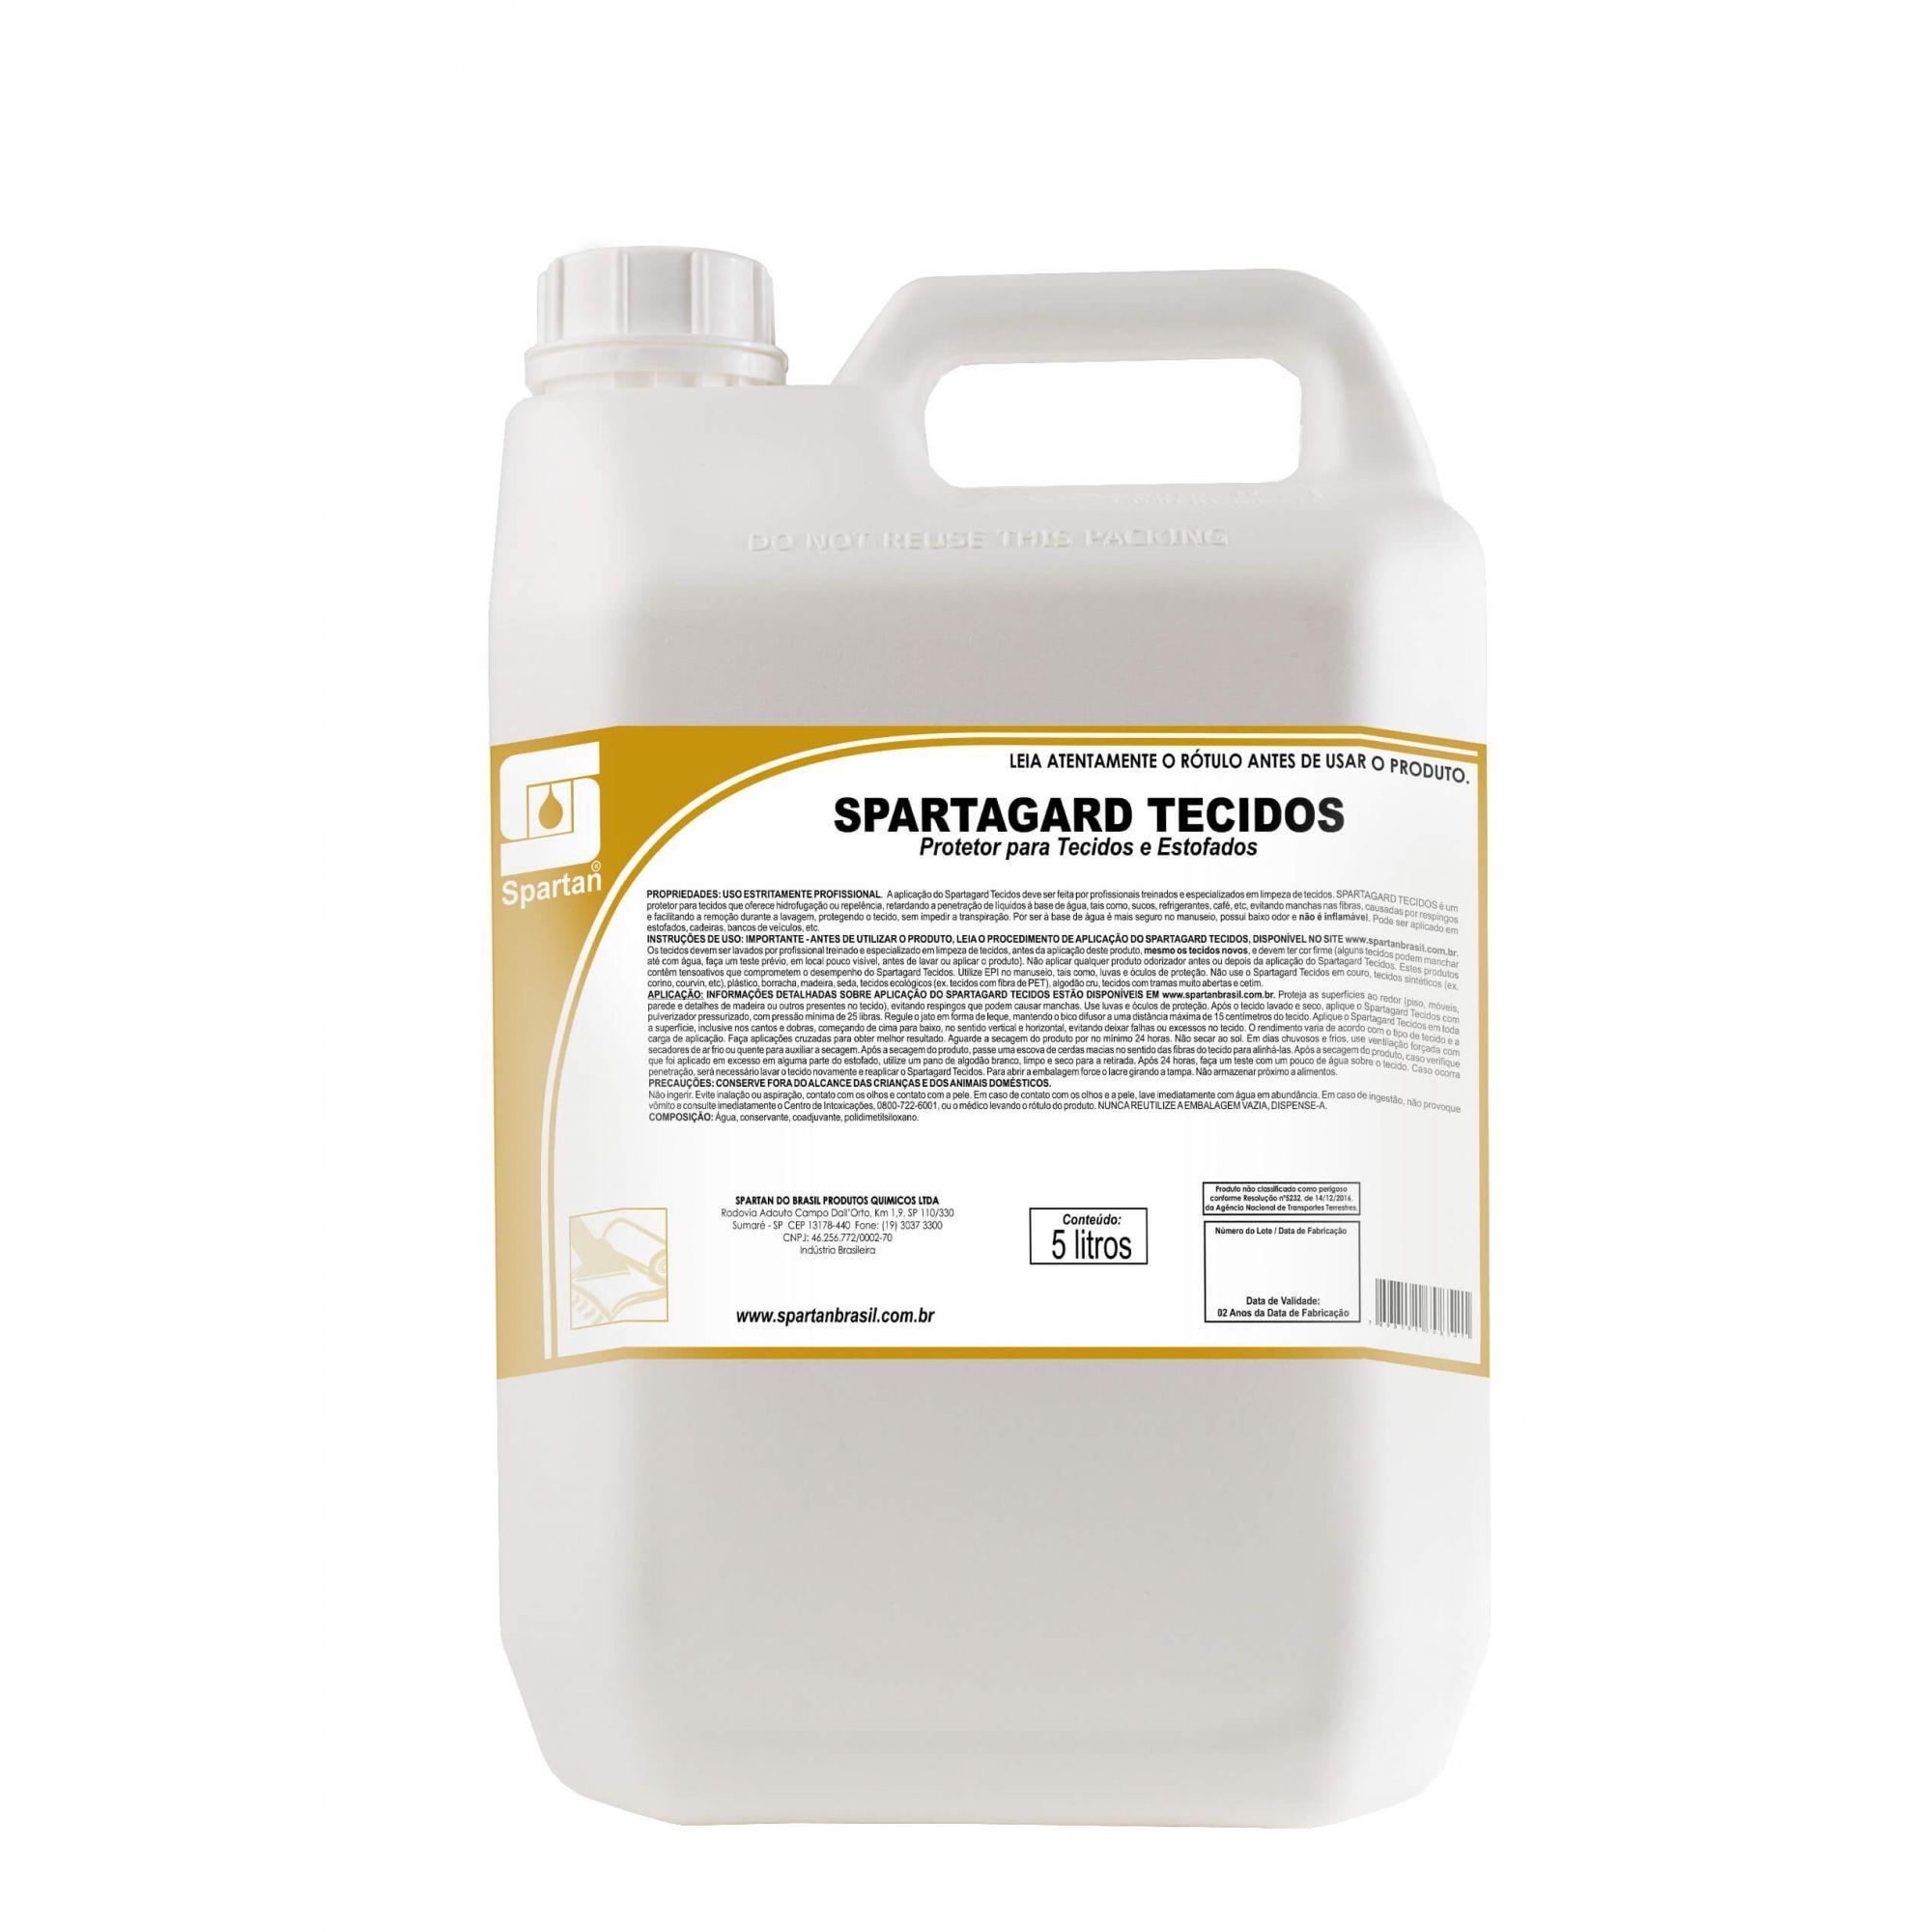 Protetor para Tecidos e Estofados Spartagard 5 Litros